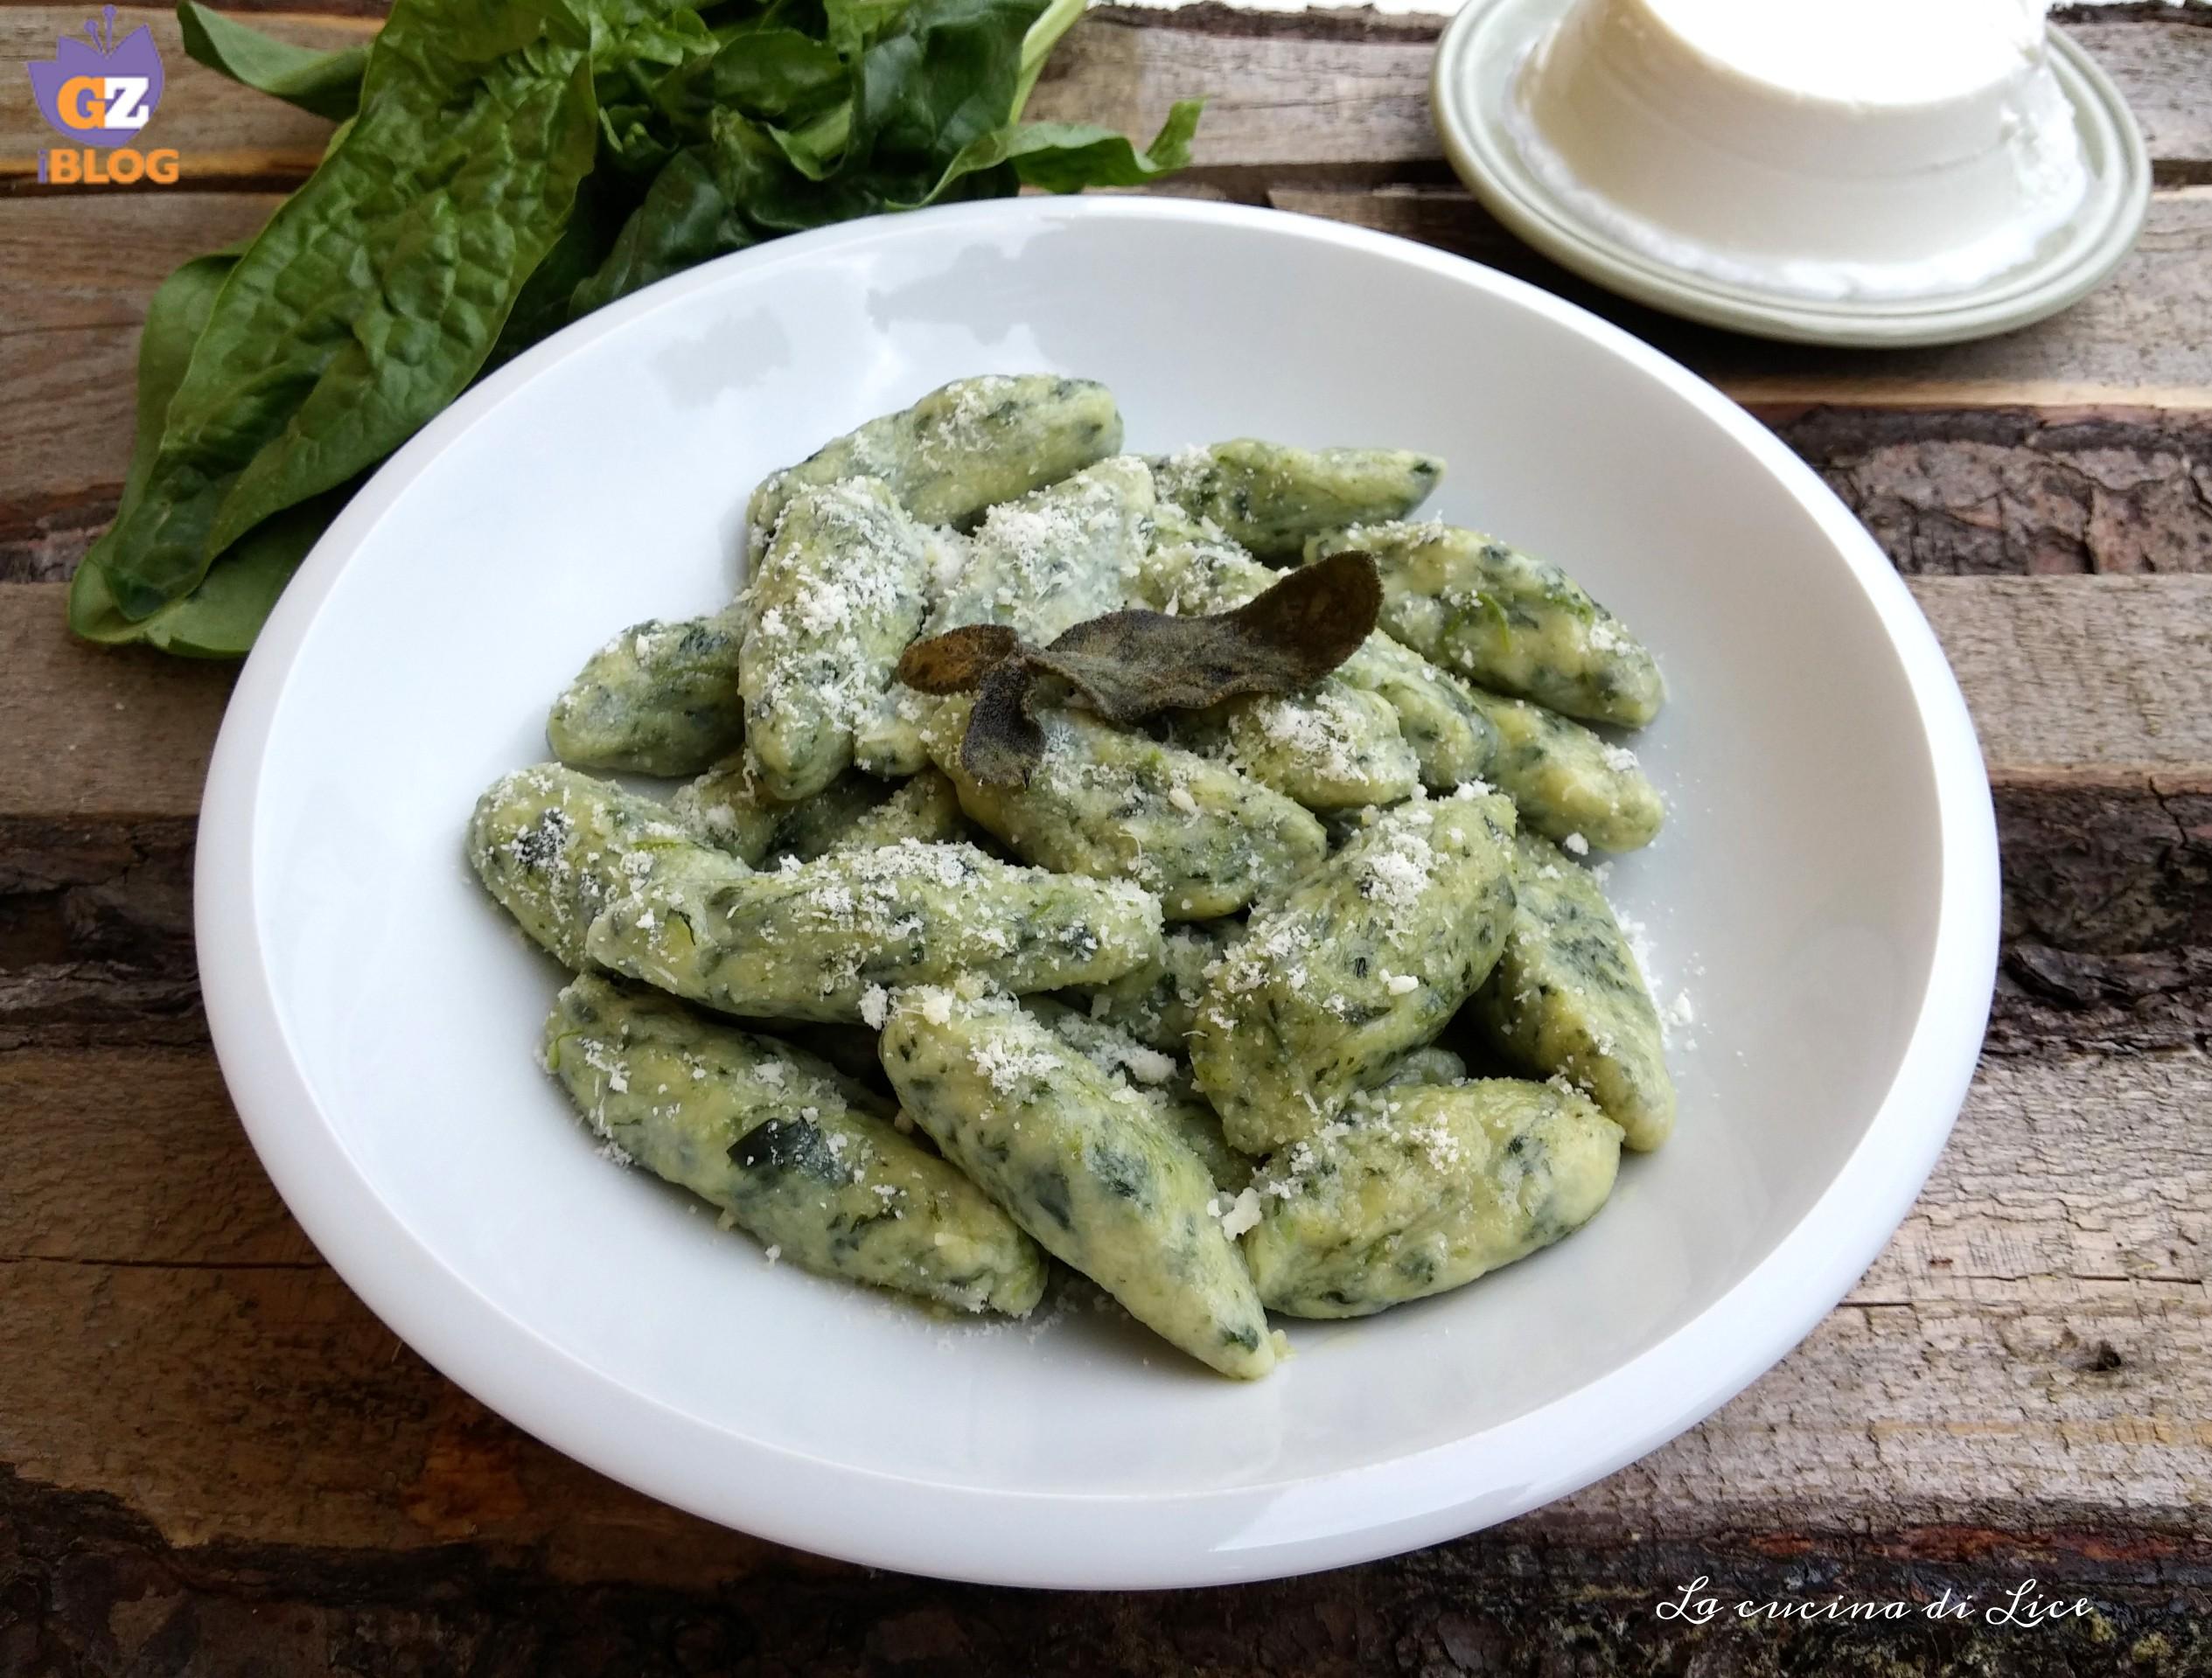 Pinlòn con ricotta e spinaci